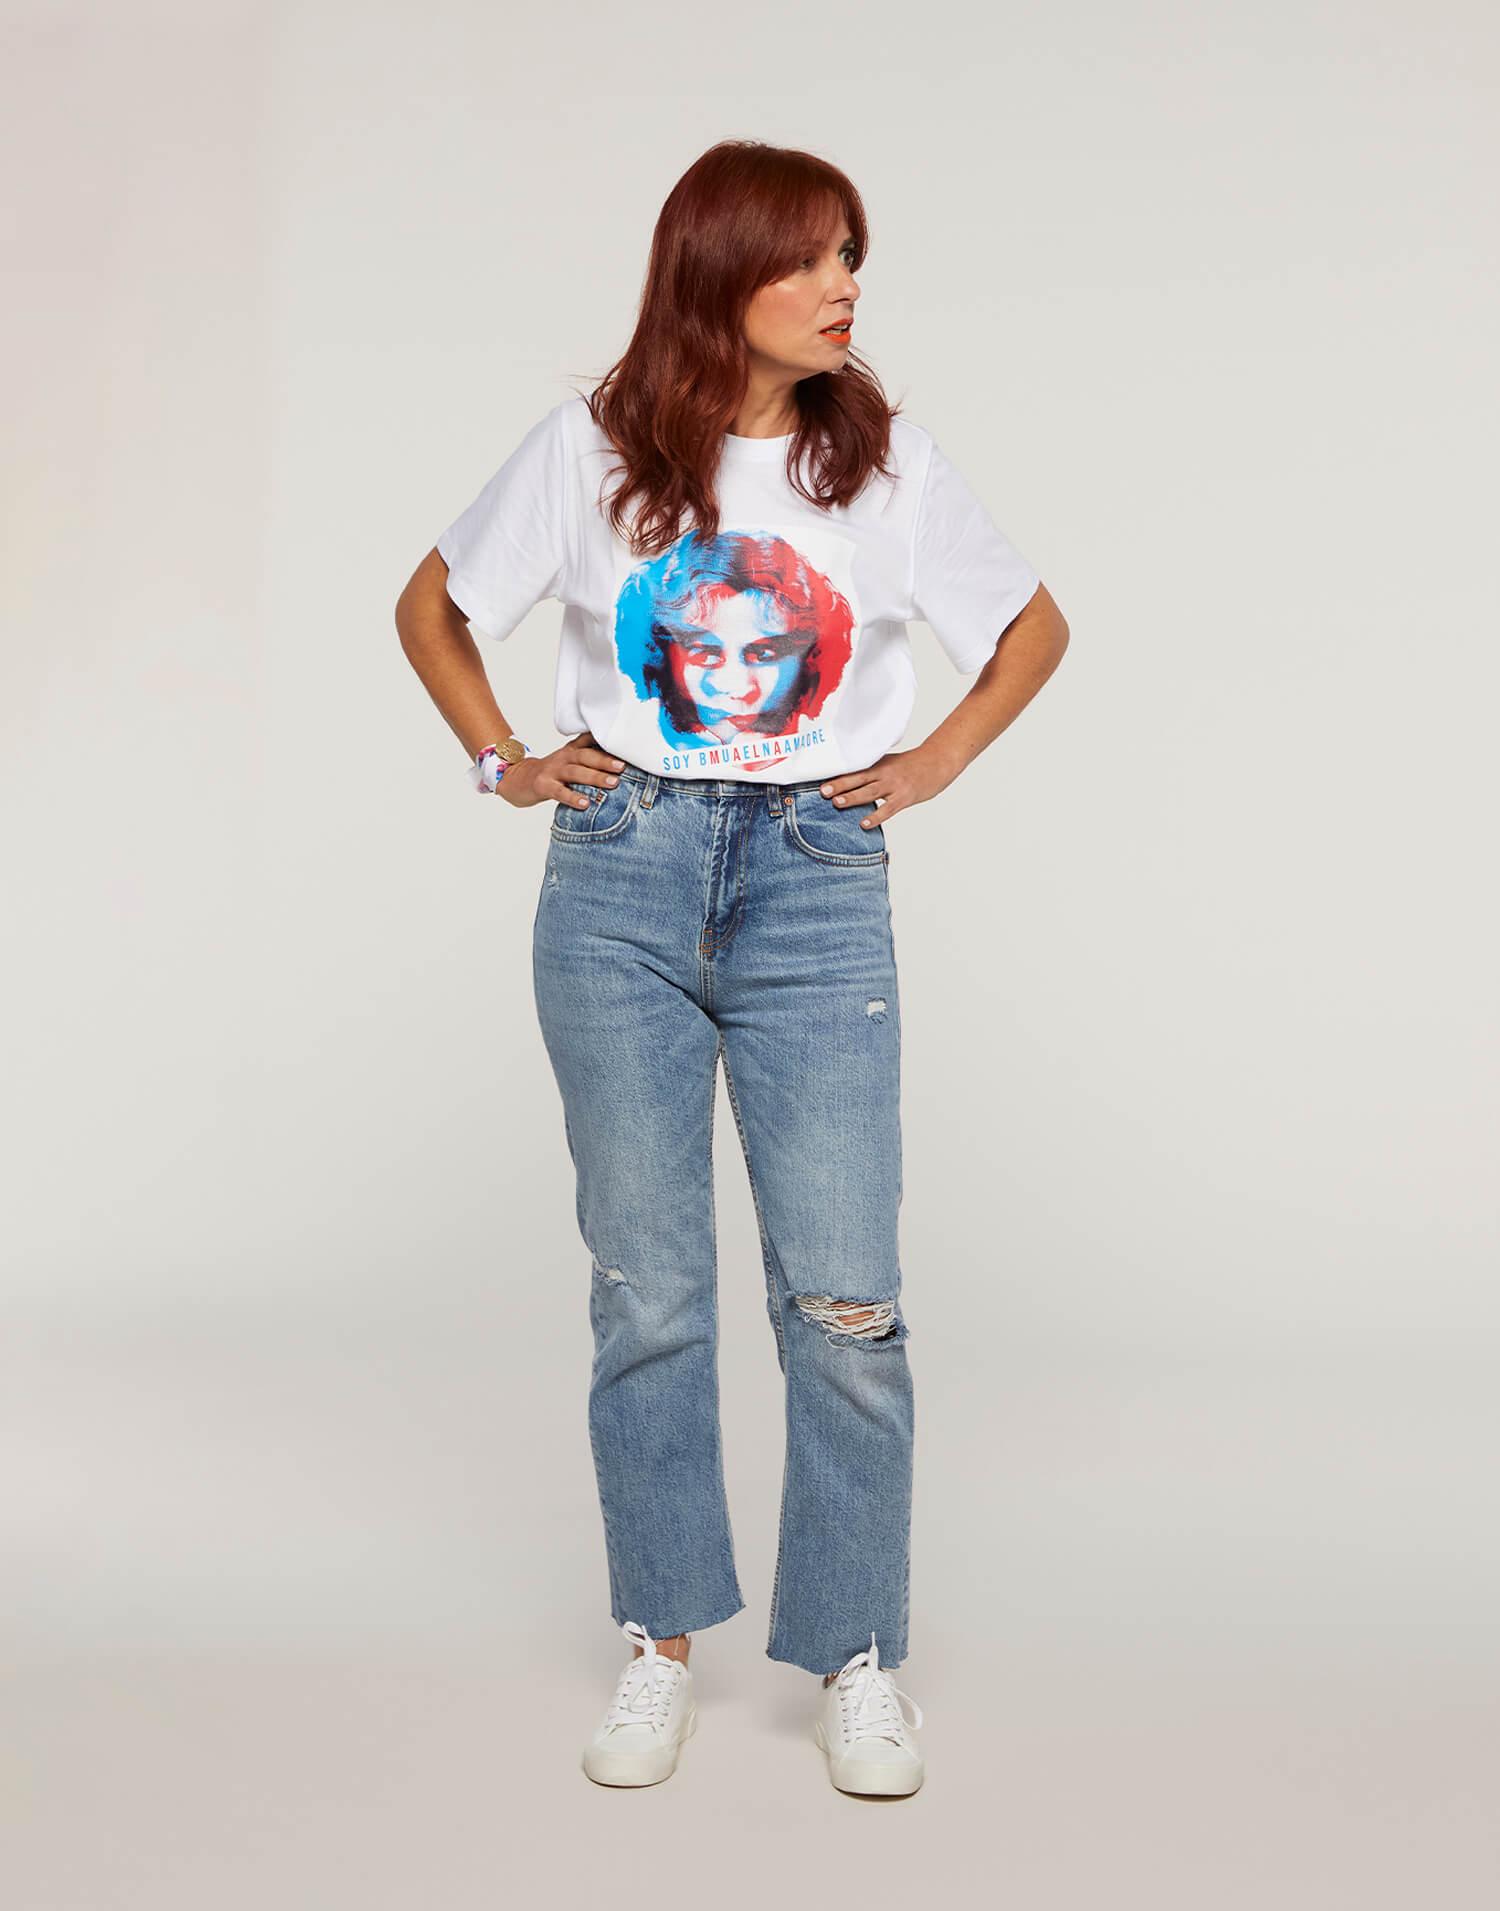 Camiseta cara 'Soy buena Malamadre'